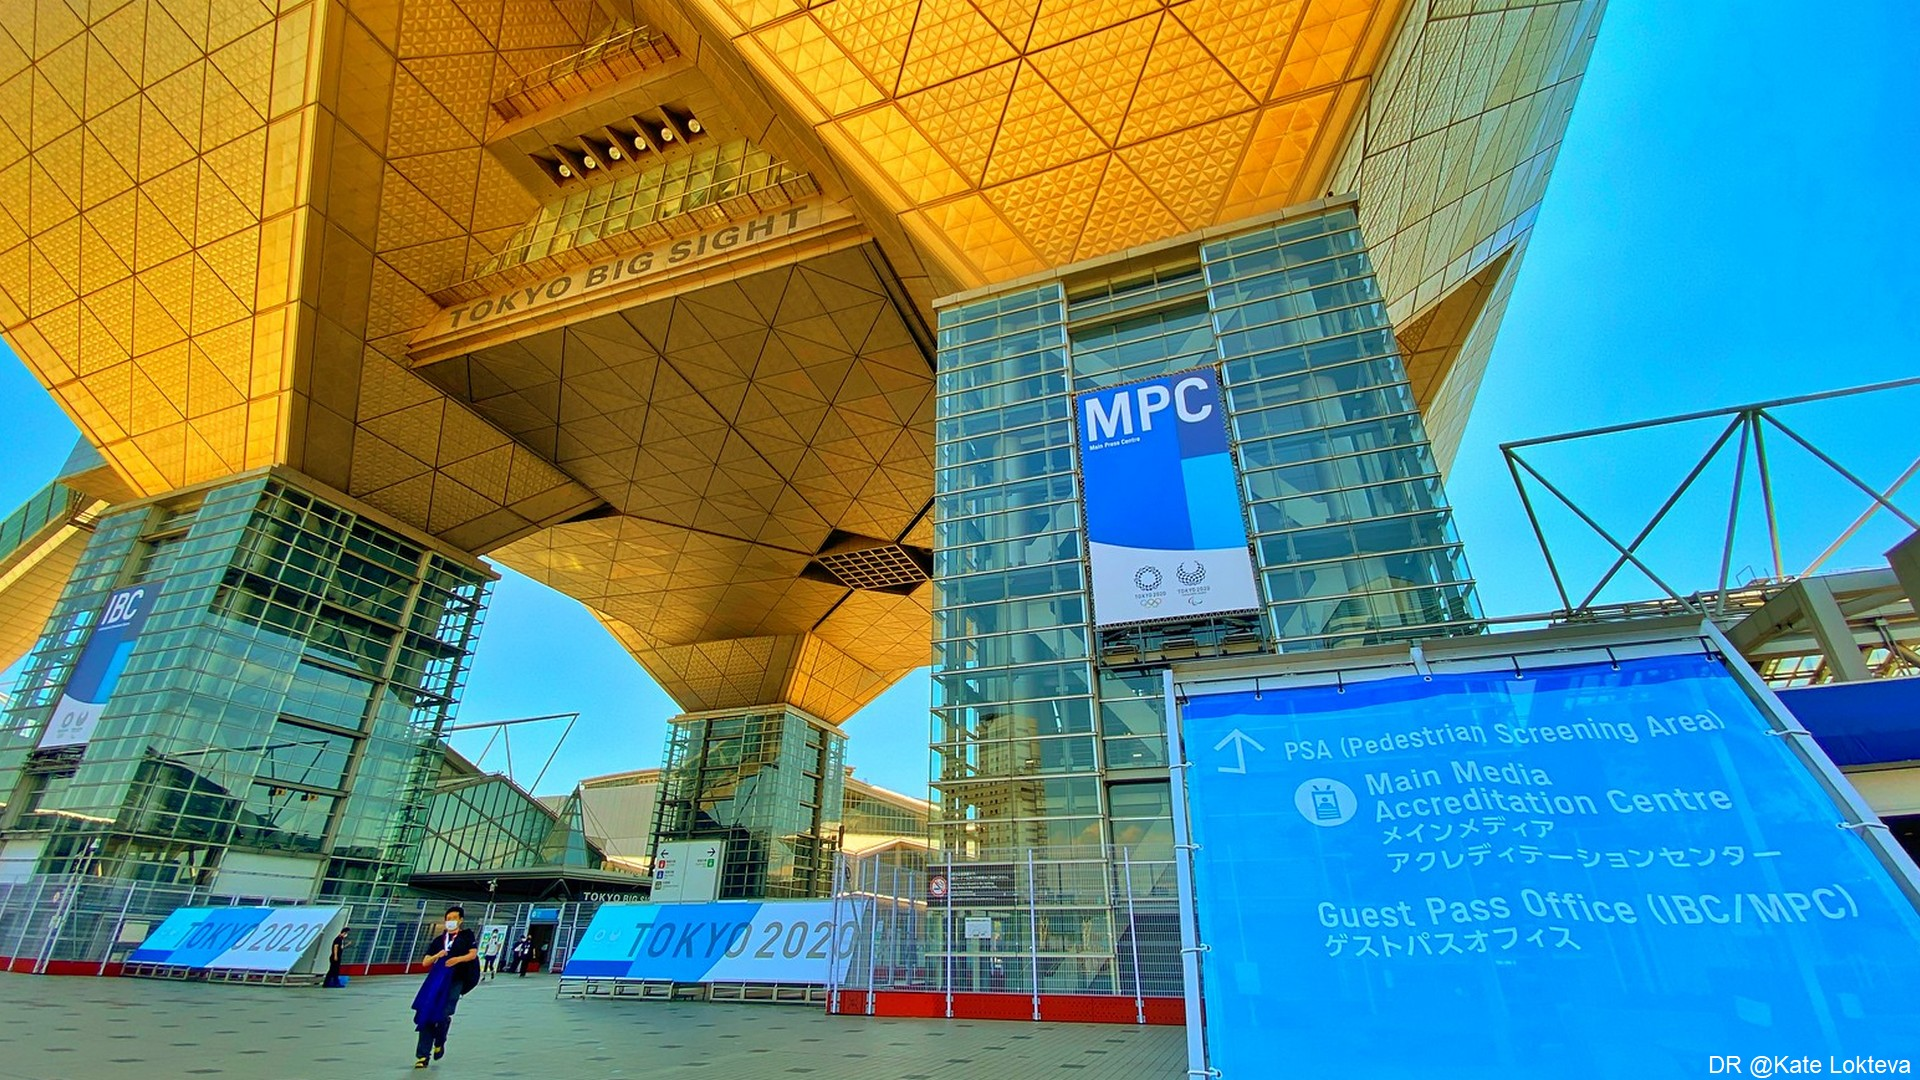 Tokyo 2020 – MPC (c)